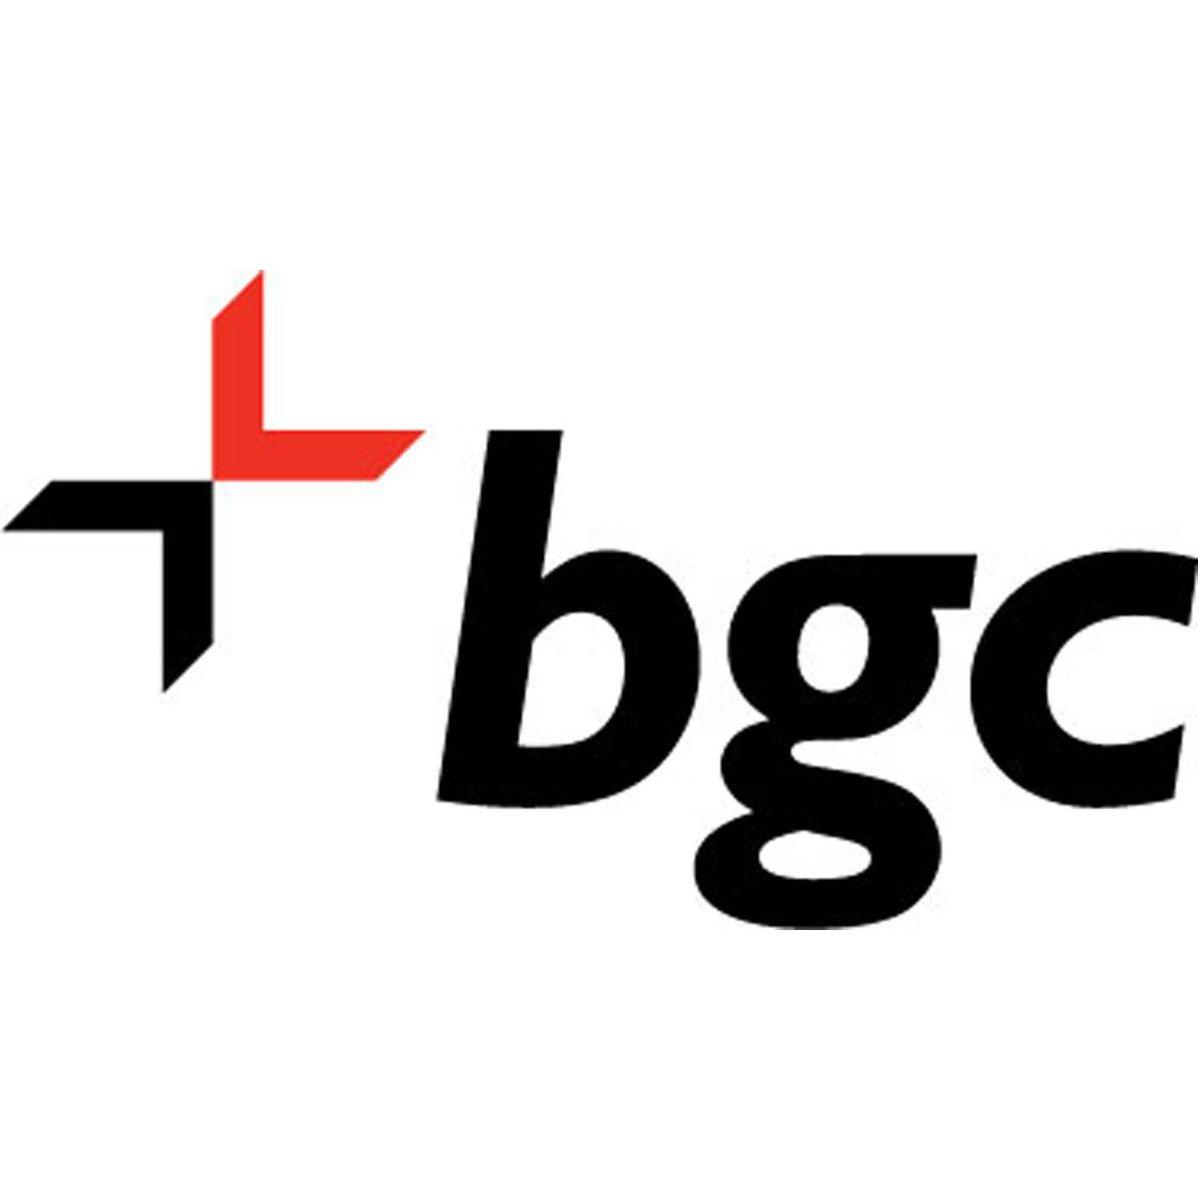 BGC ANNOUNCES PRICING OF $300 MILLION OF 4.375% SENIOR NOTES prn.to/3fe2VAr